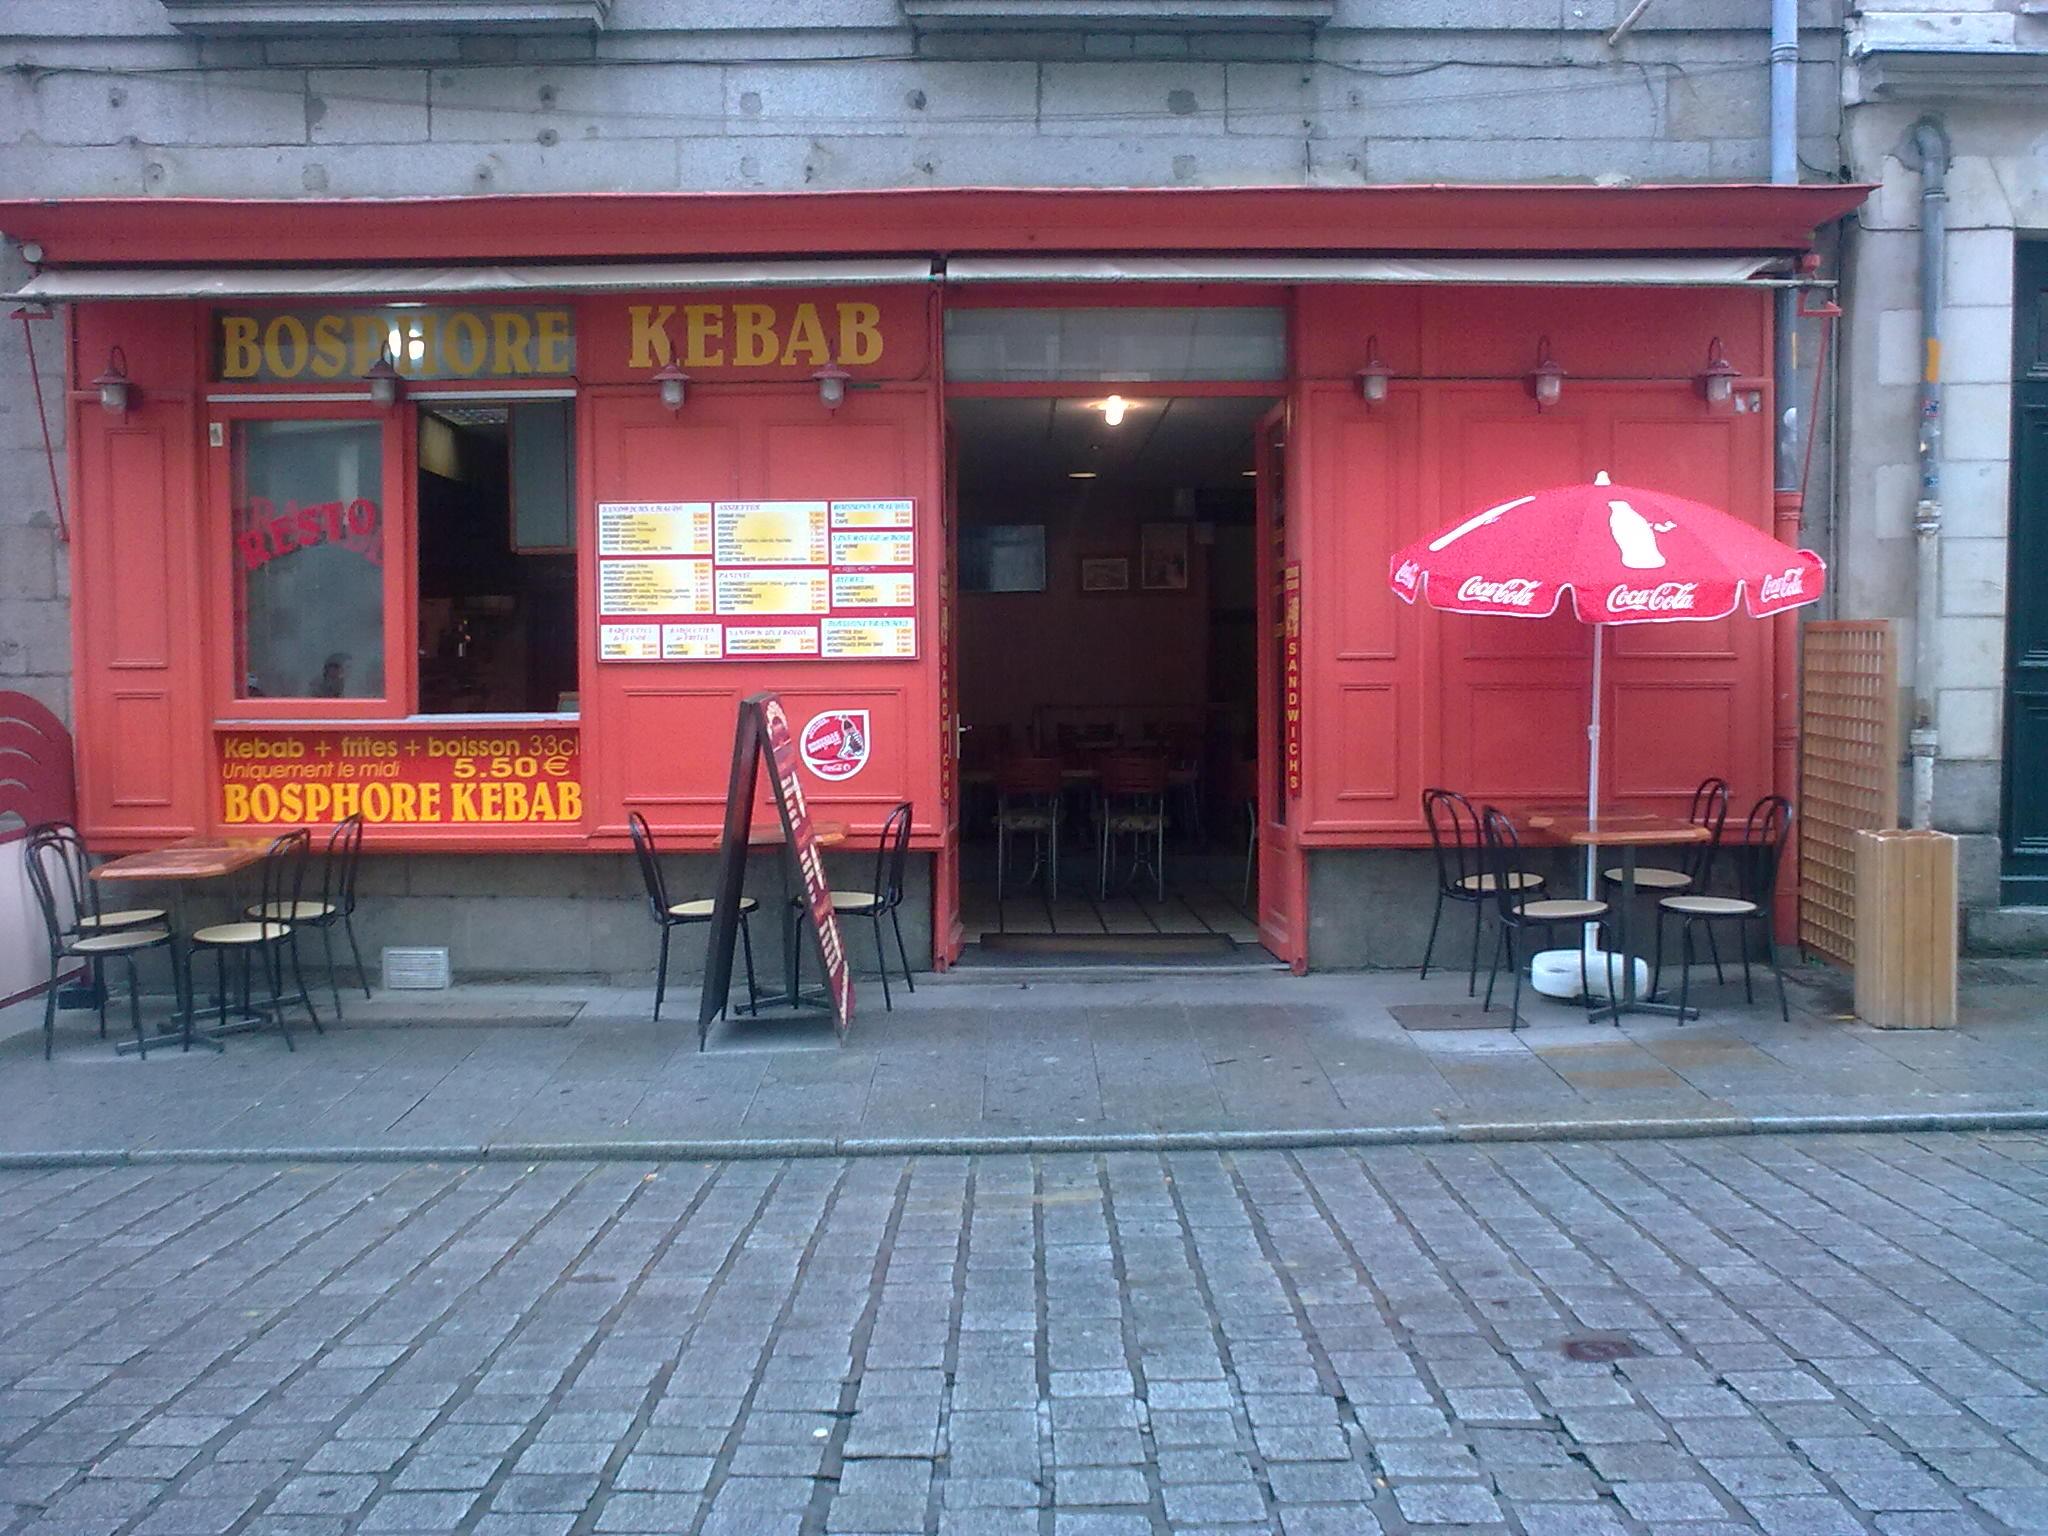 Kars Bosphore Kebab à Rennes